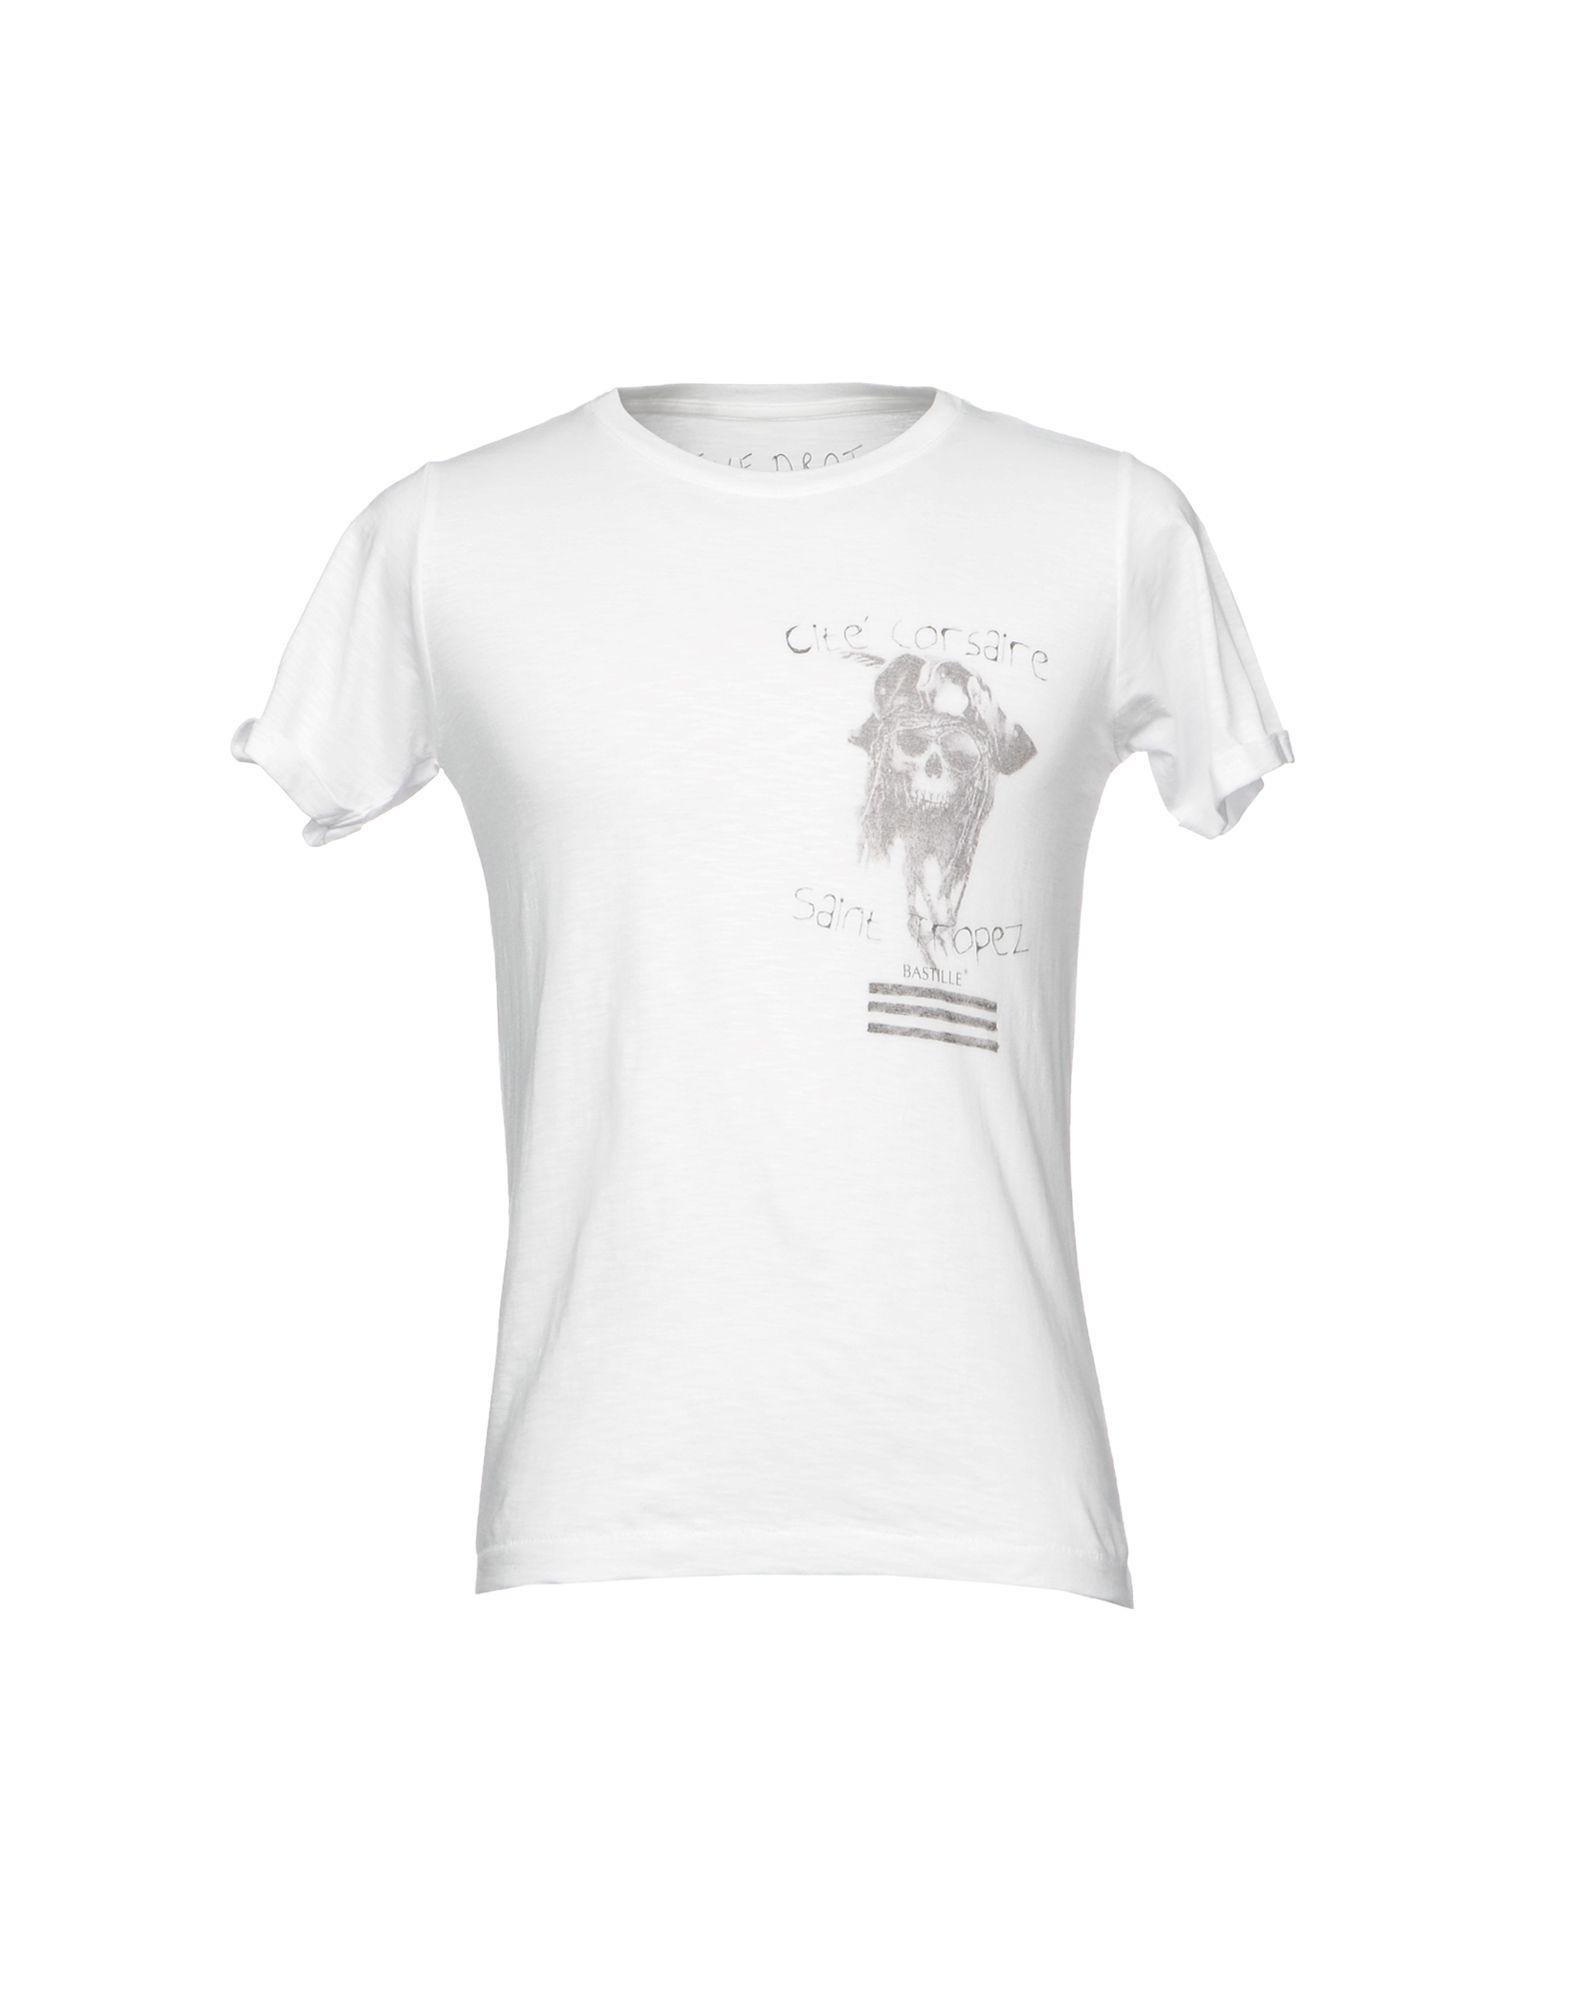 Shoppable Search Kaos Band Artic Monkeys Gildan Artwor Black 12086084ta 14 F